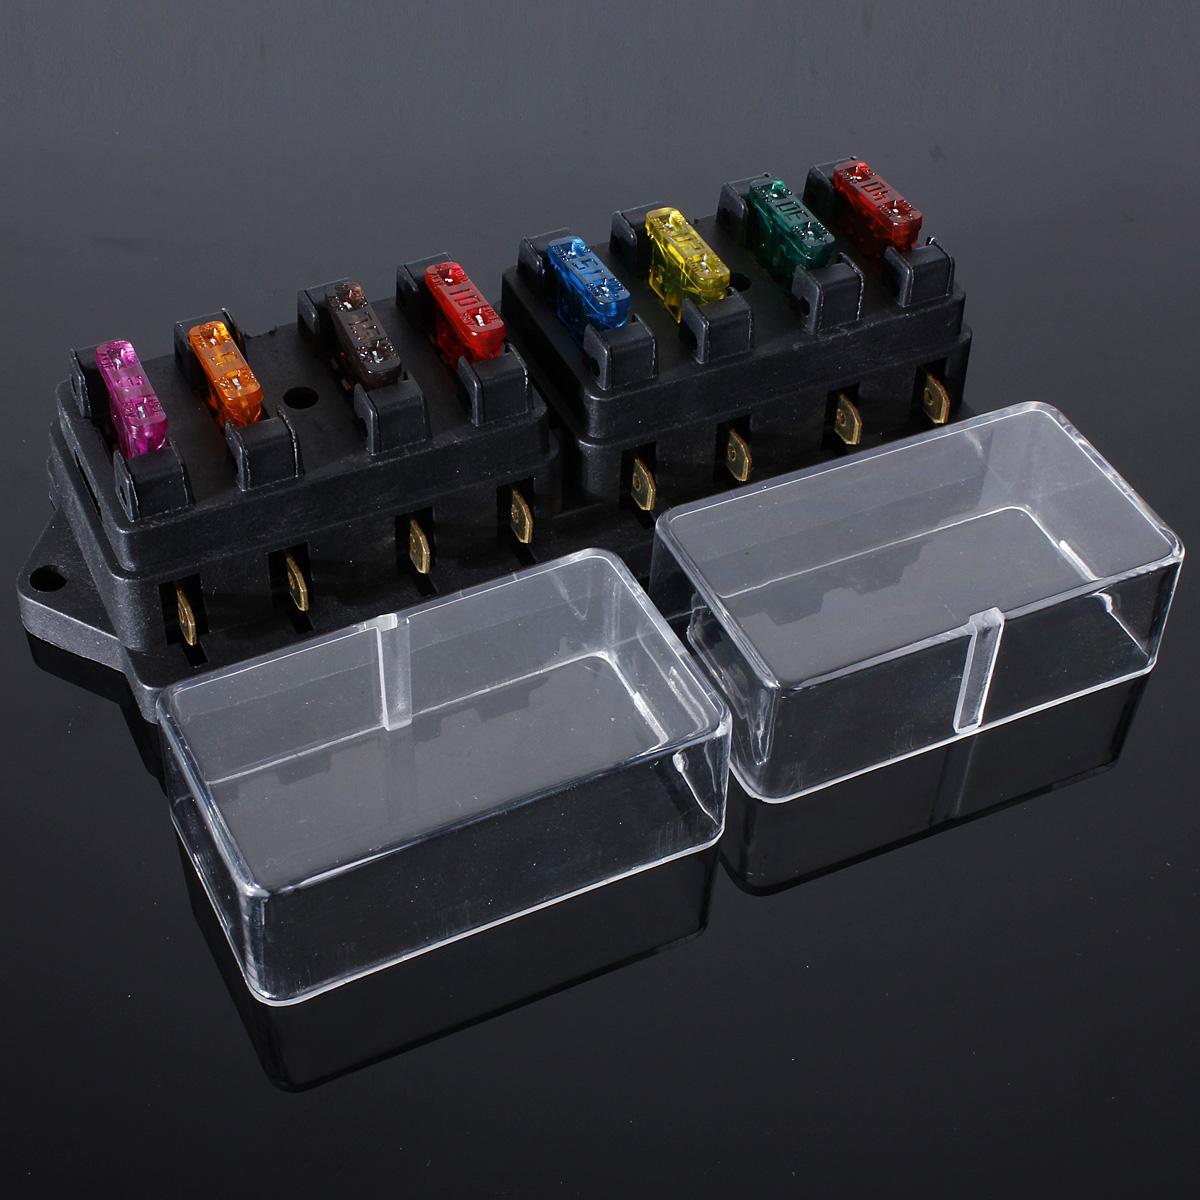 fuse holder box block 8 way car vehicle circuit automotive. Black Bedroom Furniture Sets. Home Design Ideas